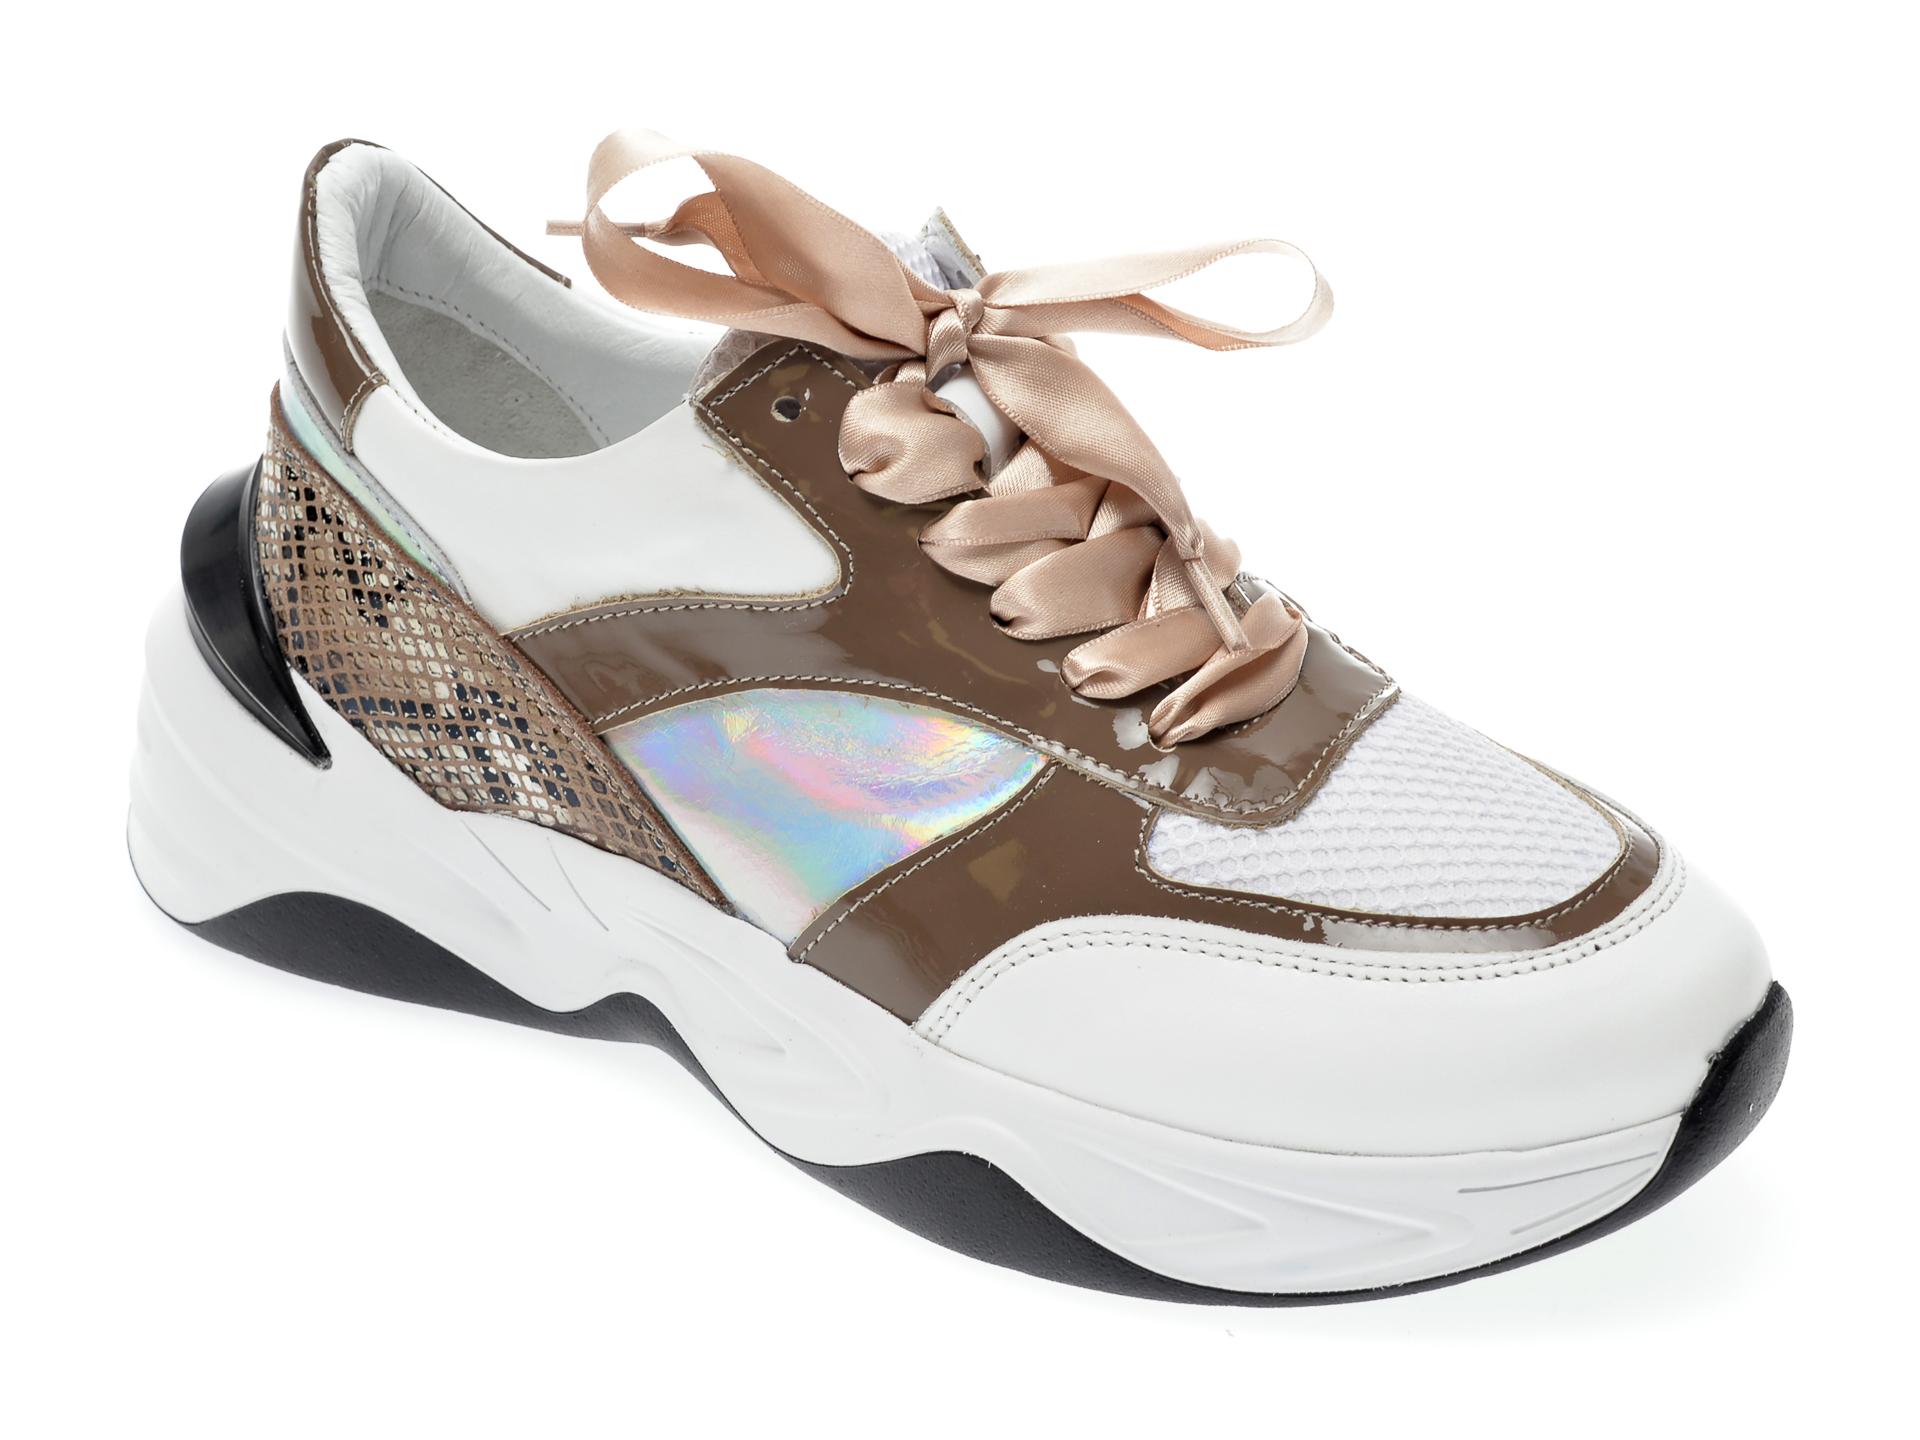 Pantofi Sport Epica Maro, 135p249, Din Piele Naturala Si Material Textil